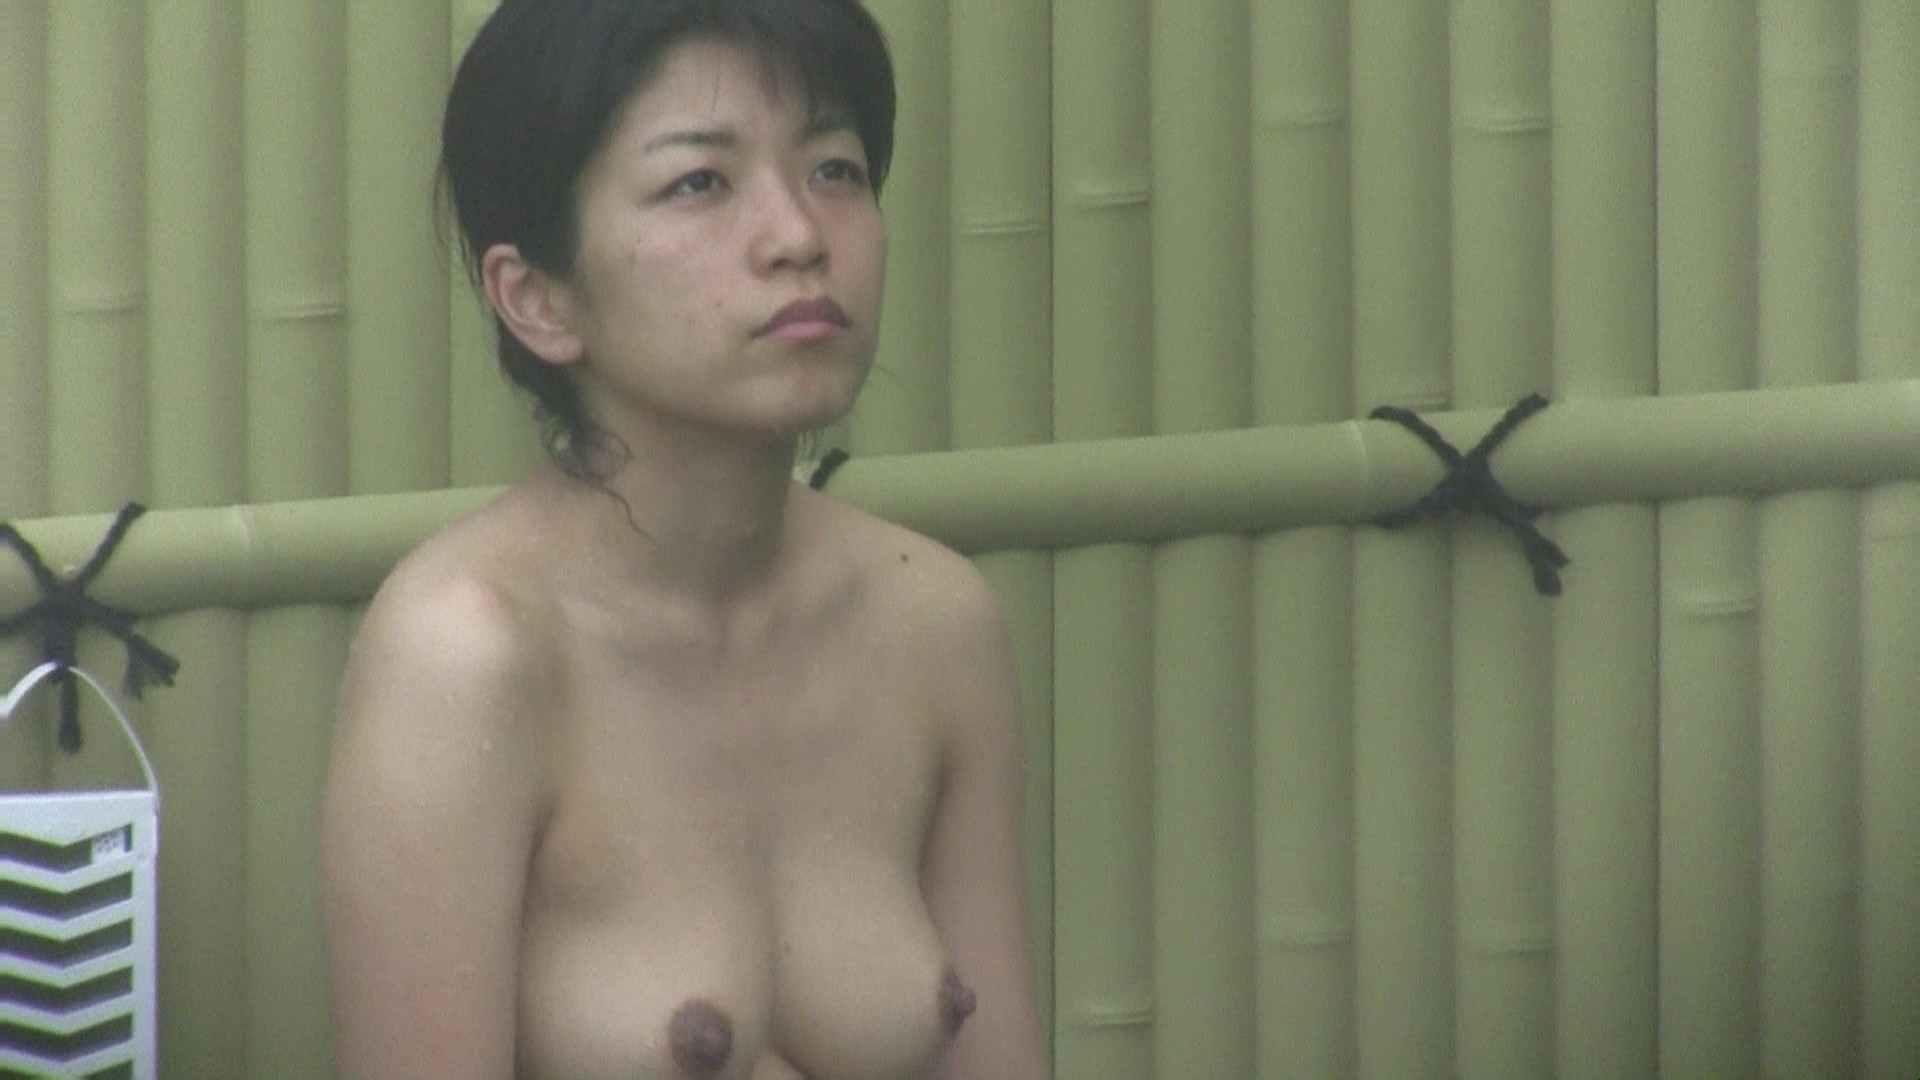 Aquaな露天風呂Vol.585 露天 オマンコ無修正動画無料 51画像 8